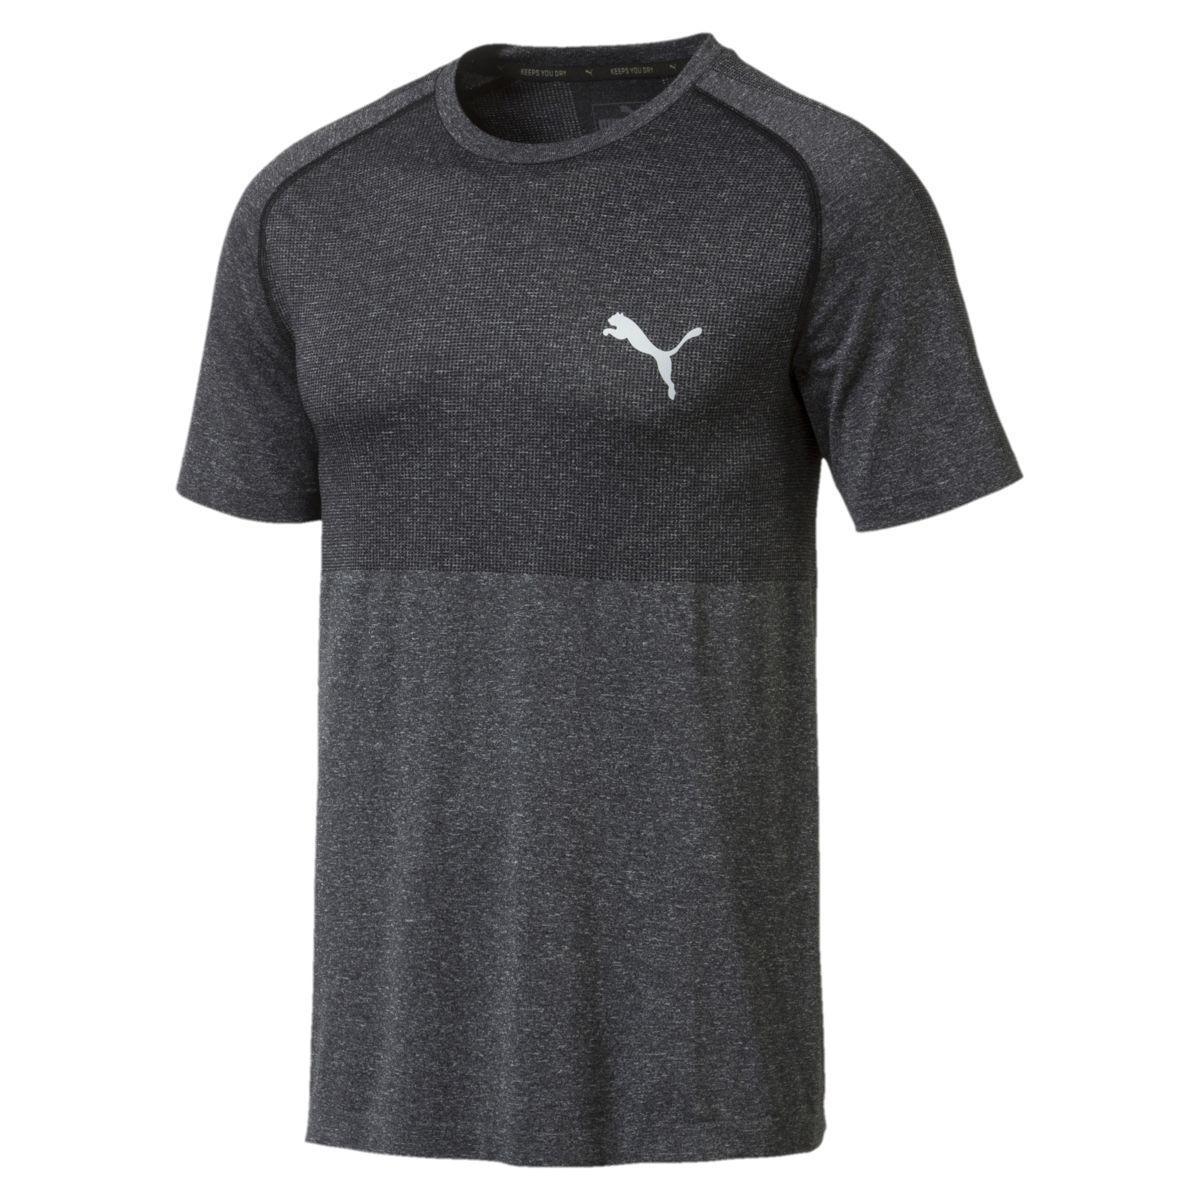 Puma Men's Evoknit Basic Tee - Black, XL